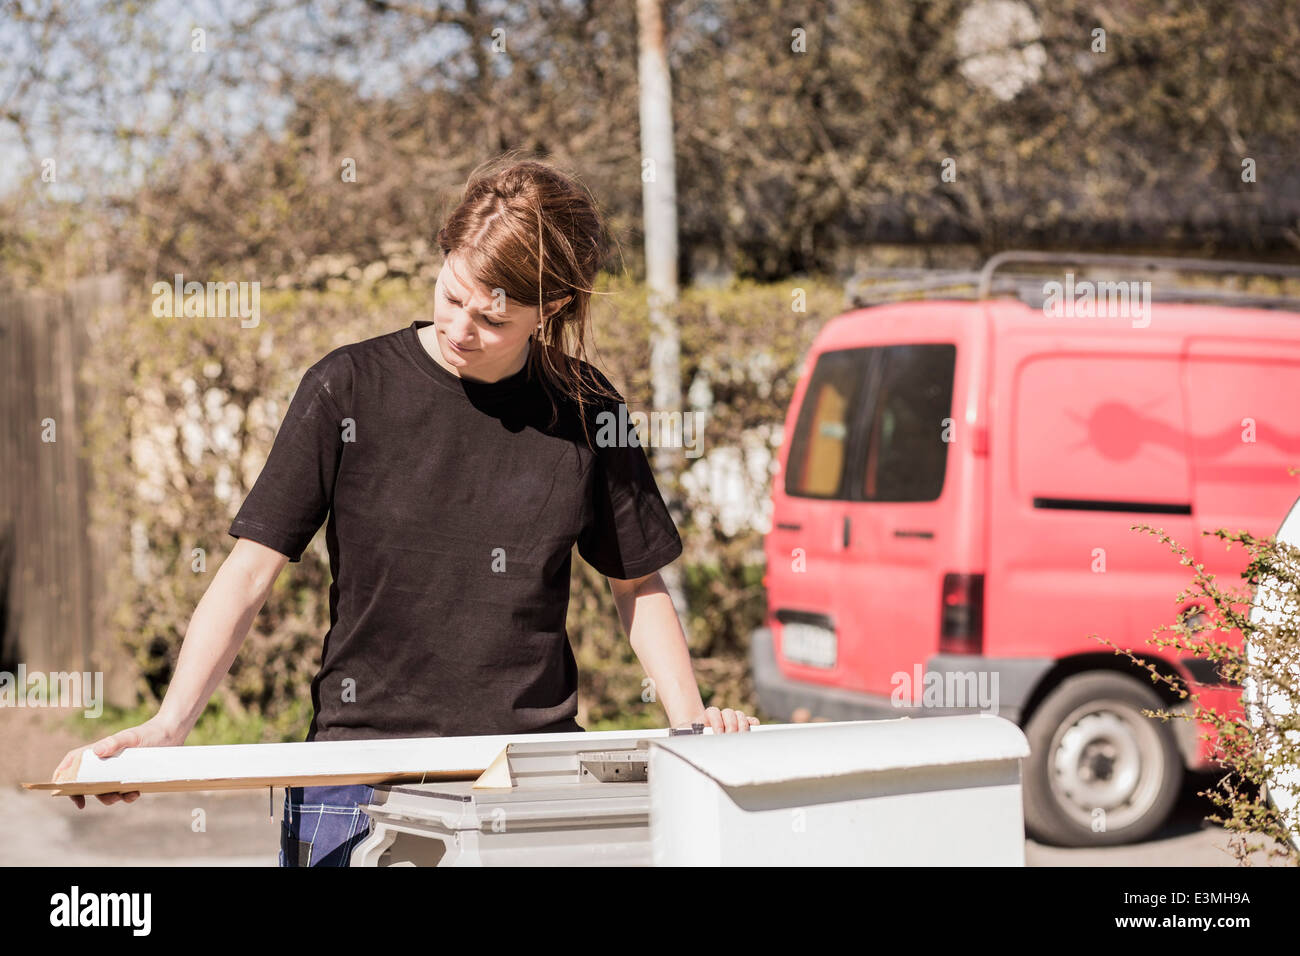 Female carpenter examining wooden plank outdoors - Stock Image